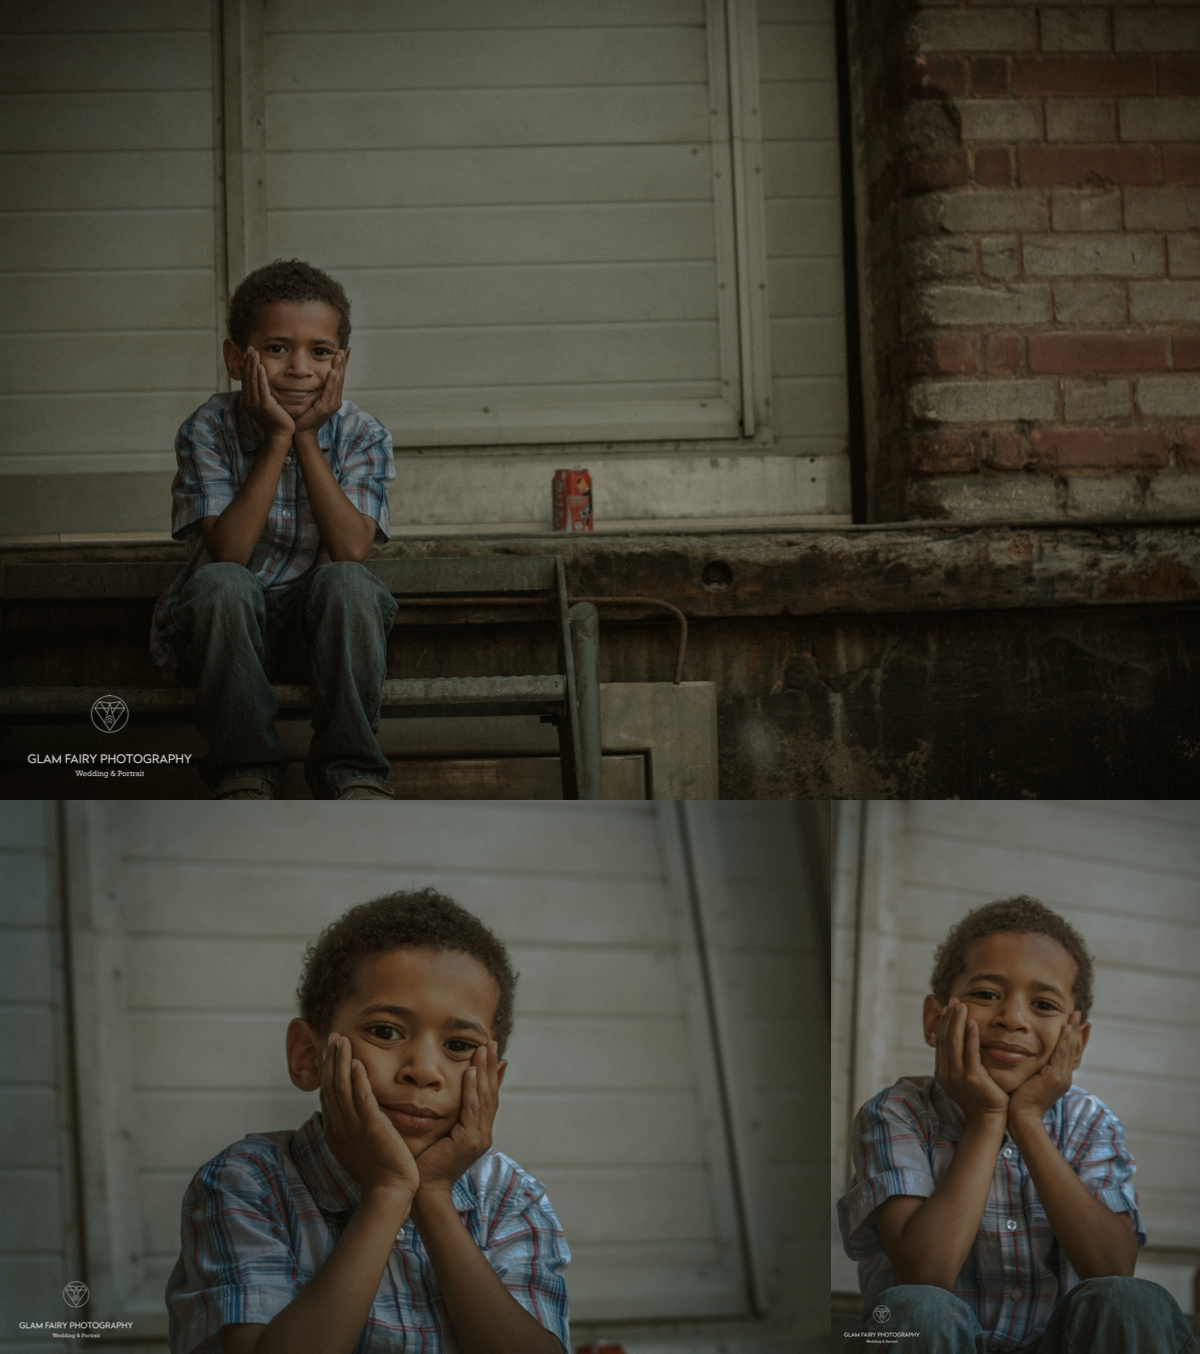 GlamFairyPhotography-photographe-seance-enfant-american vintage-alfortville-Nathan_0006